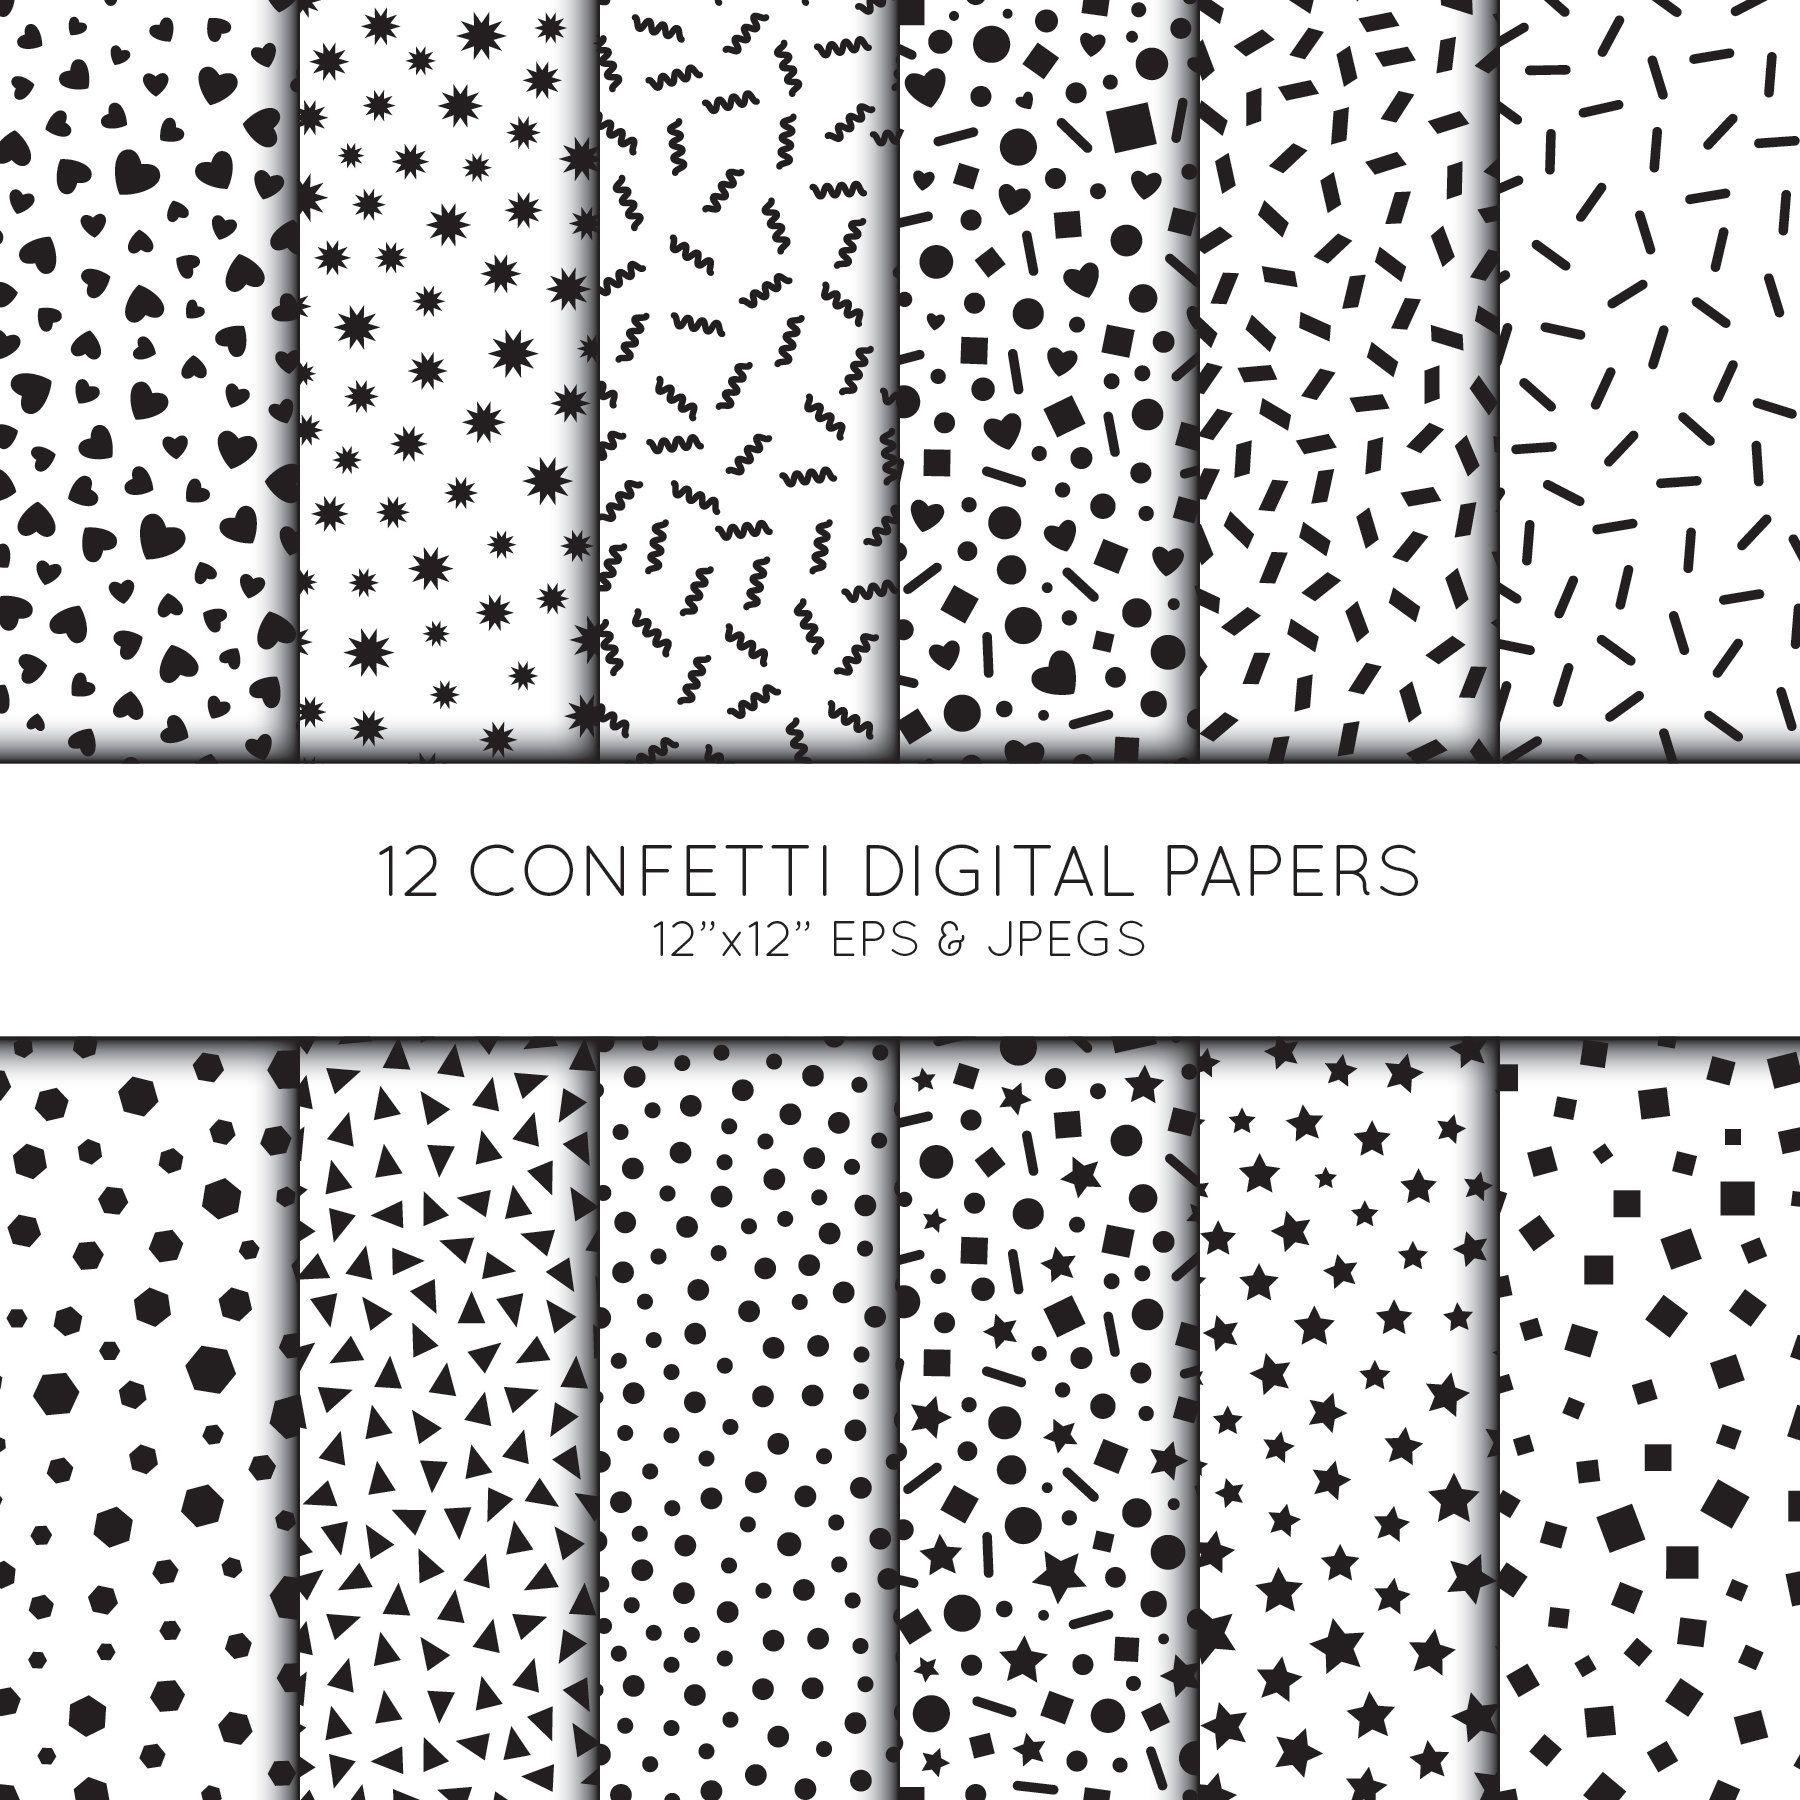 Party Digital Paper Confetti Scrapbook Paper Sprinkles Etsy In 2021 Digital Paper Scrapbook Paper Etsy